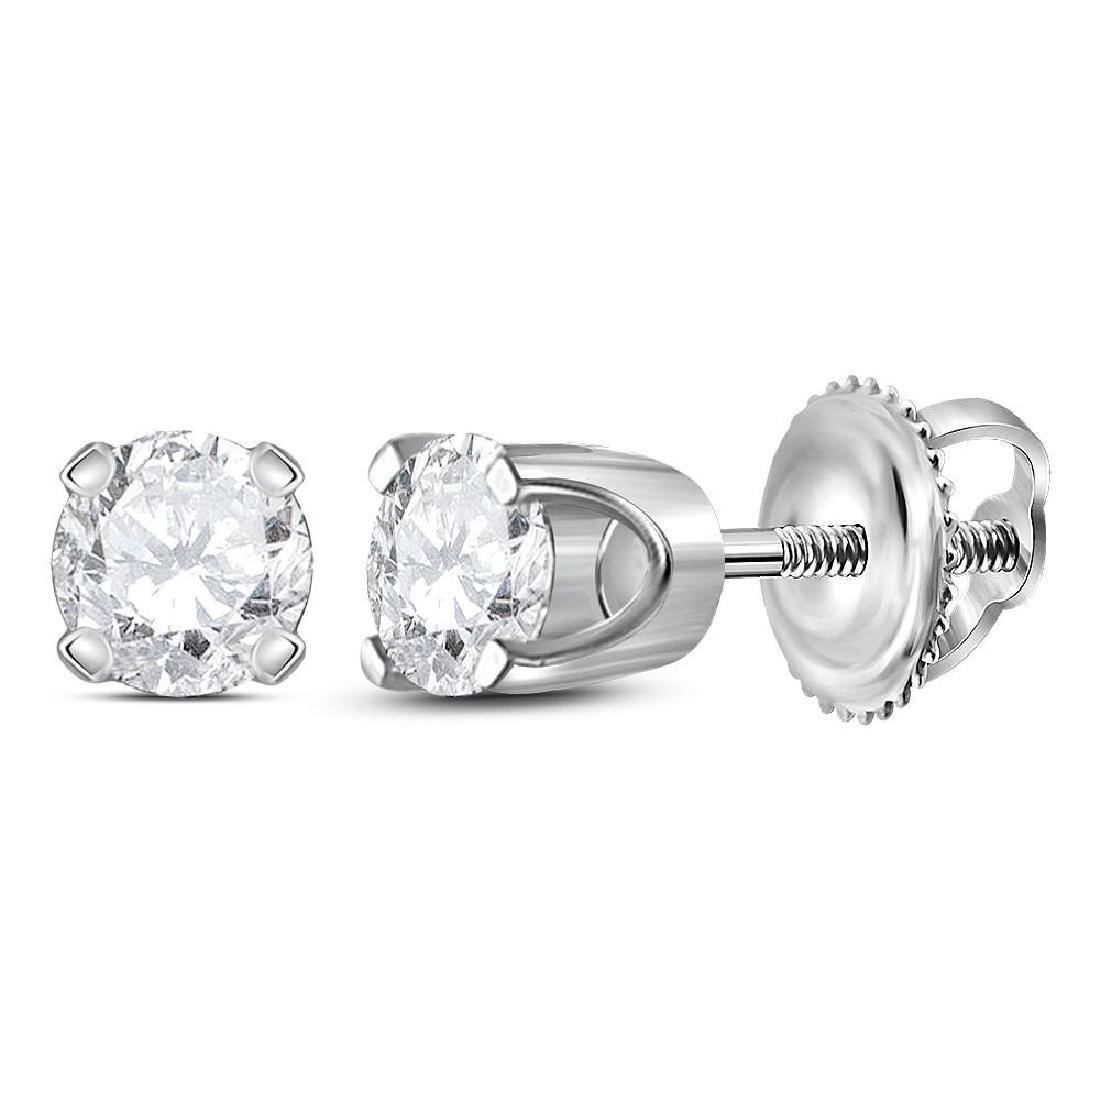 0.39 CTW Diamond Solitaire Stud Earrings 14KT White